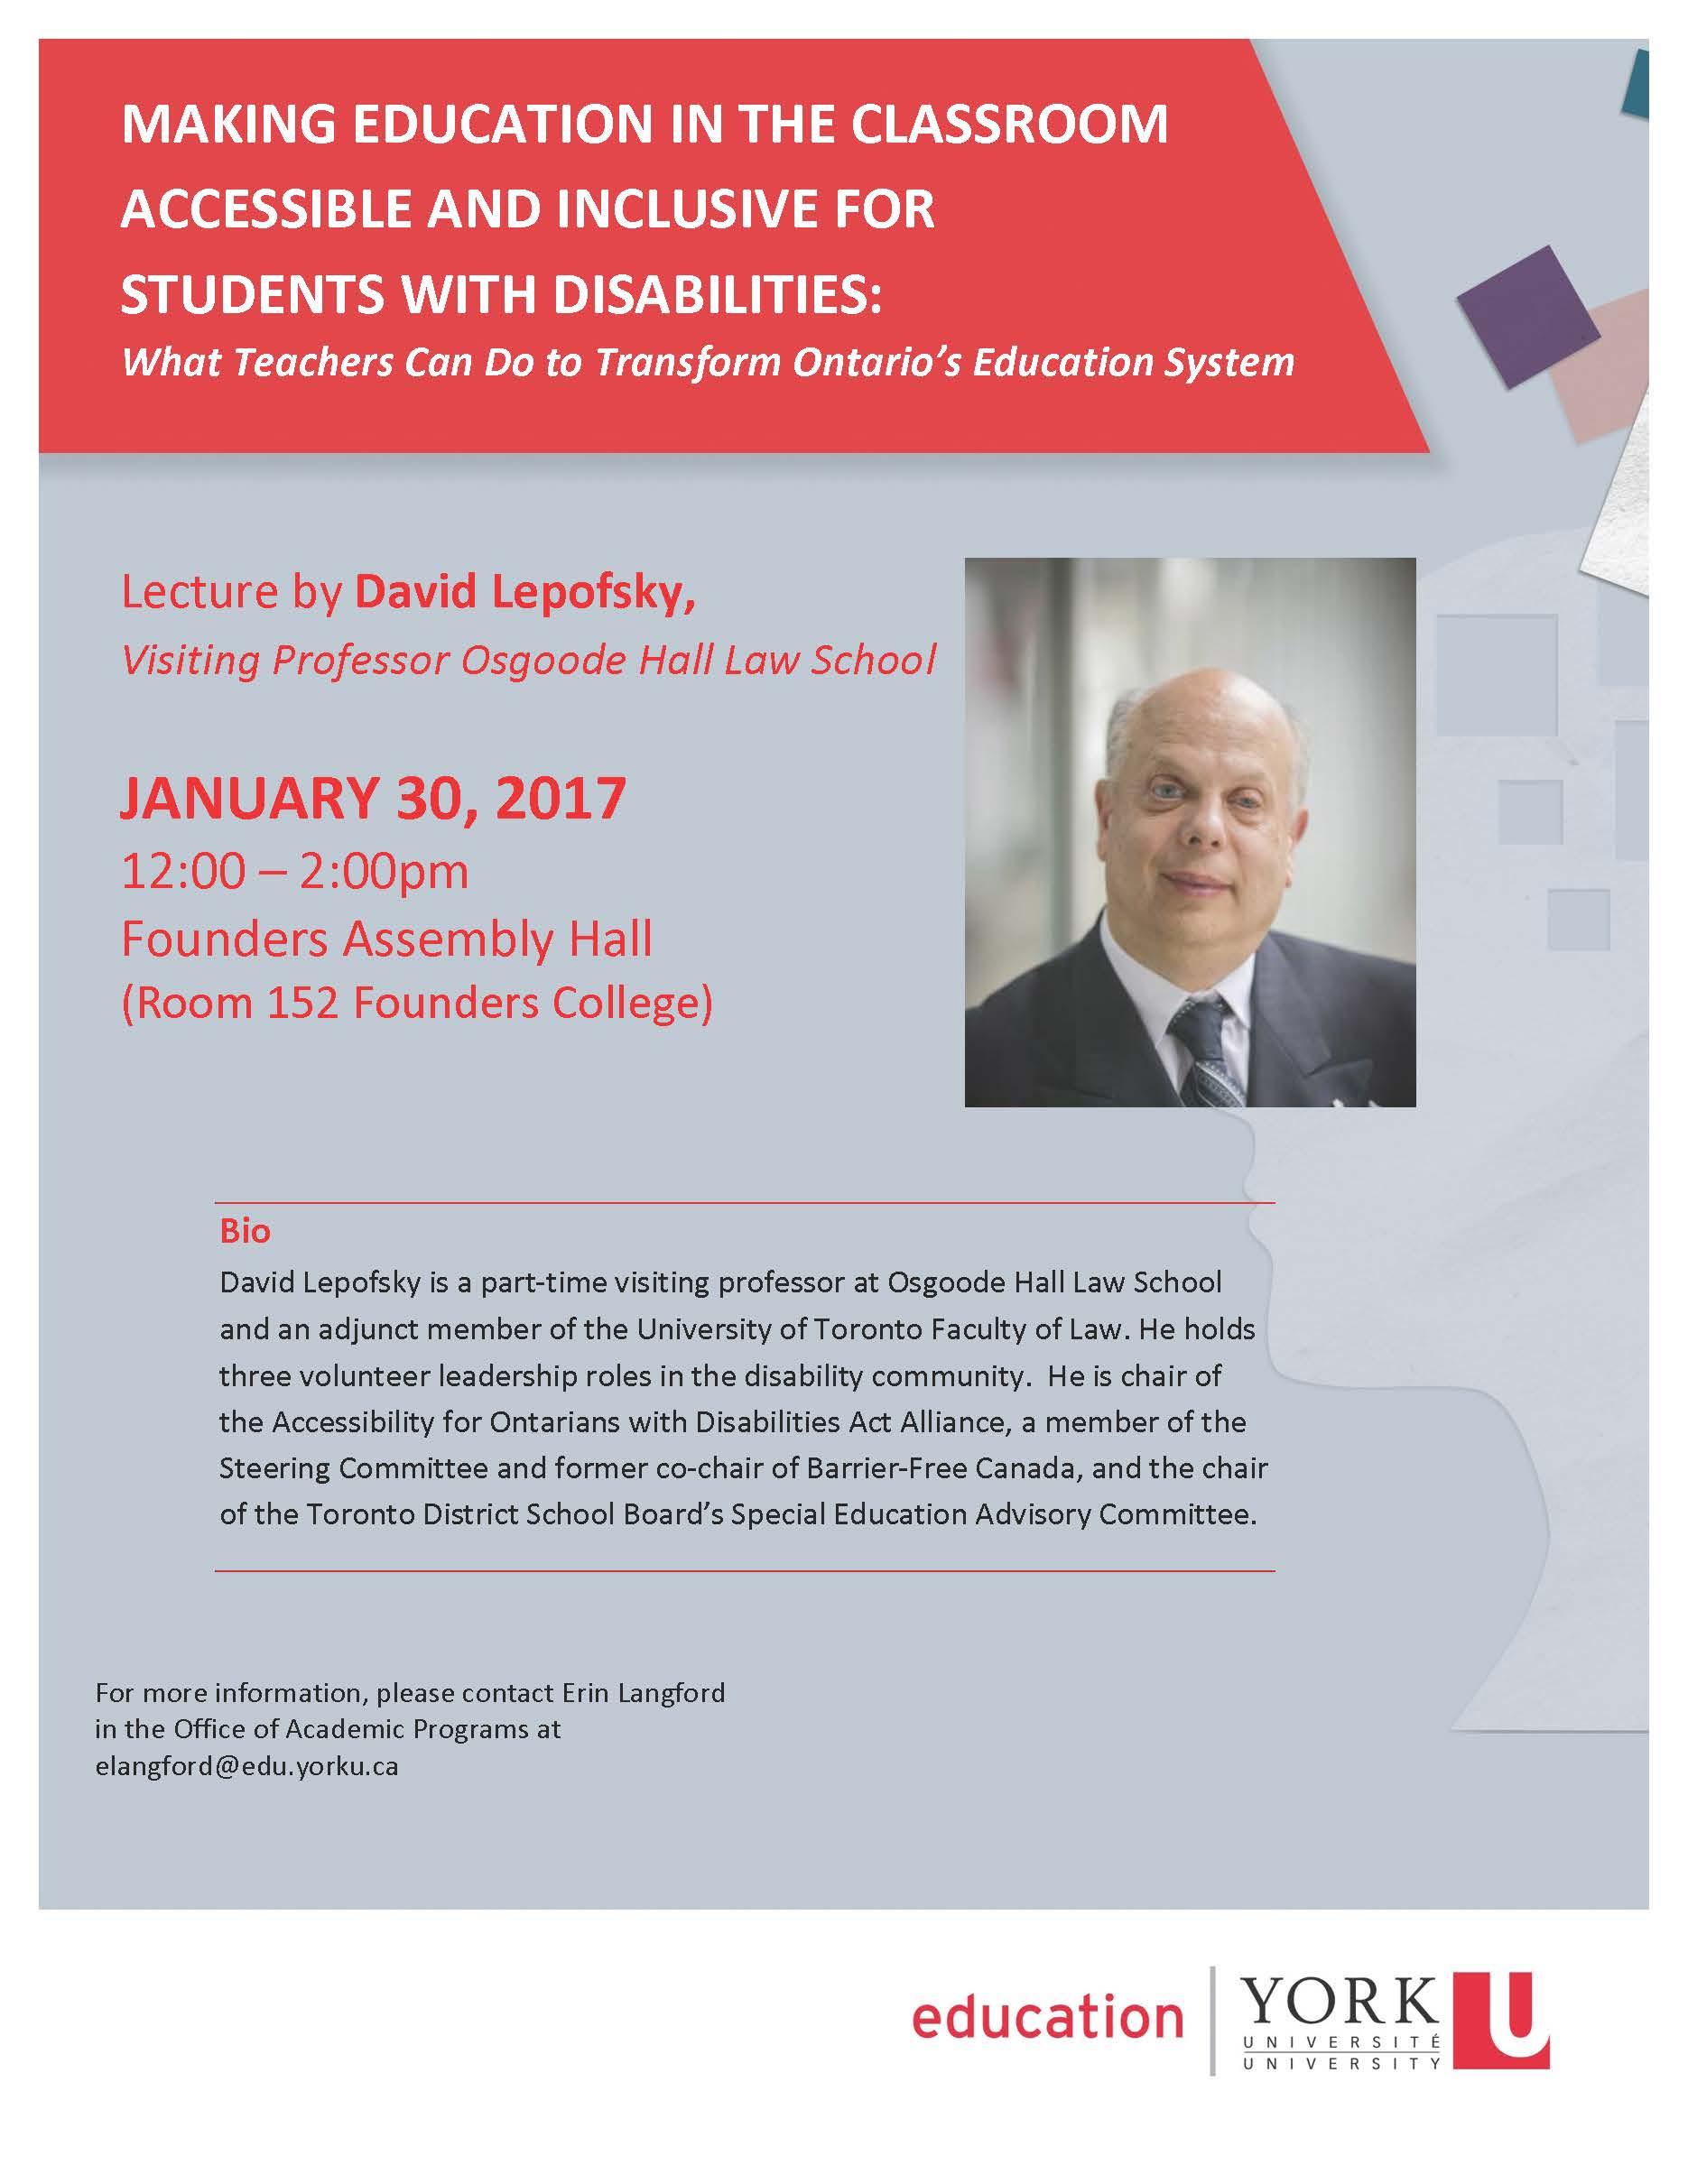 David Lepofsky event flyer